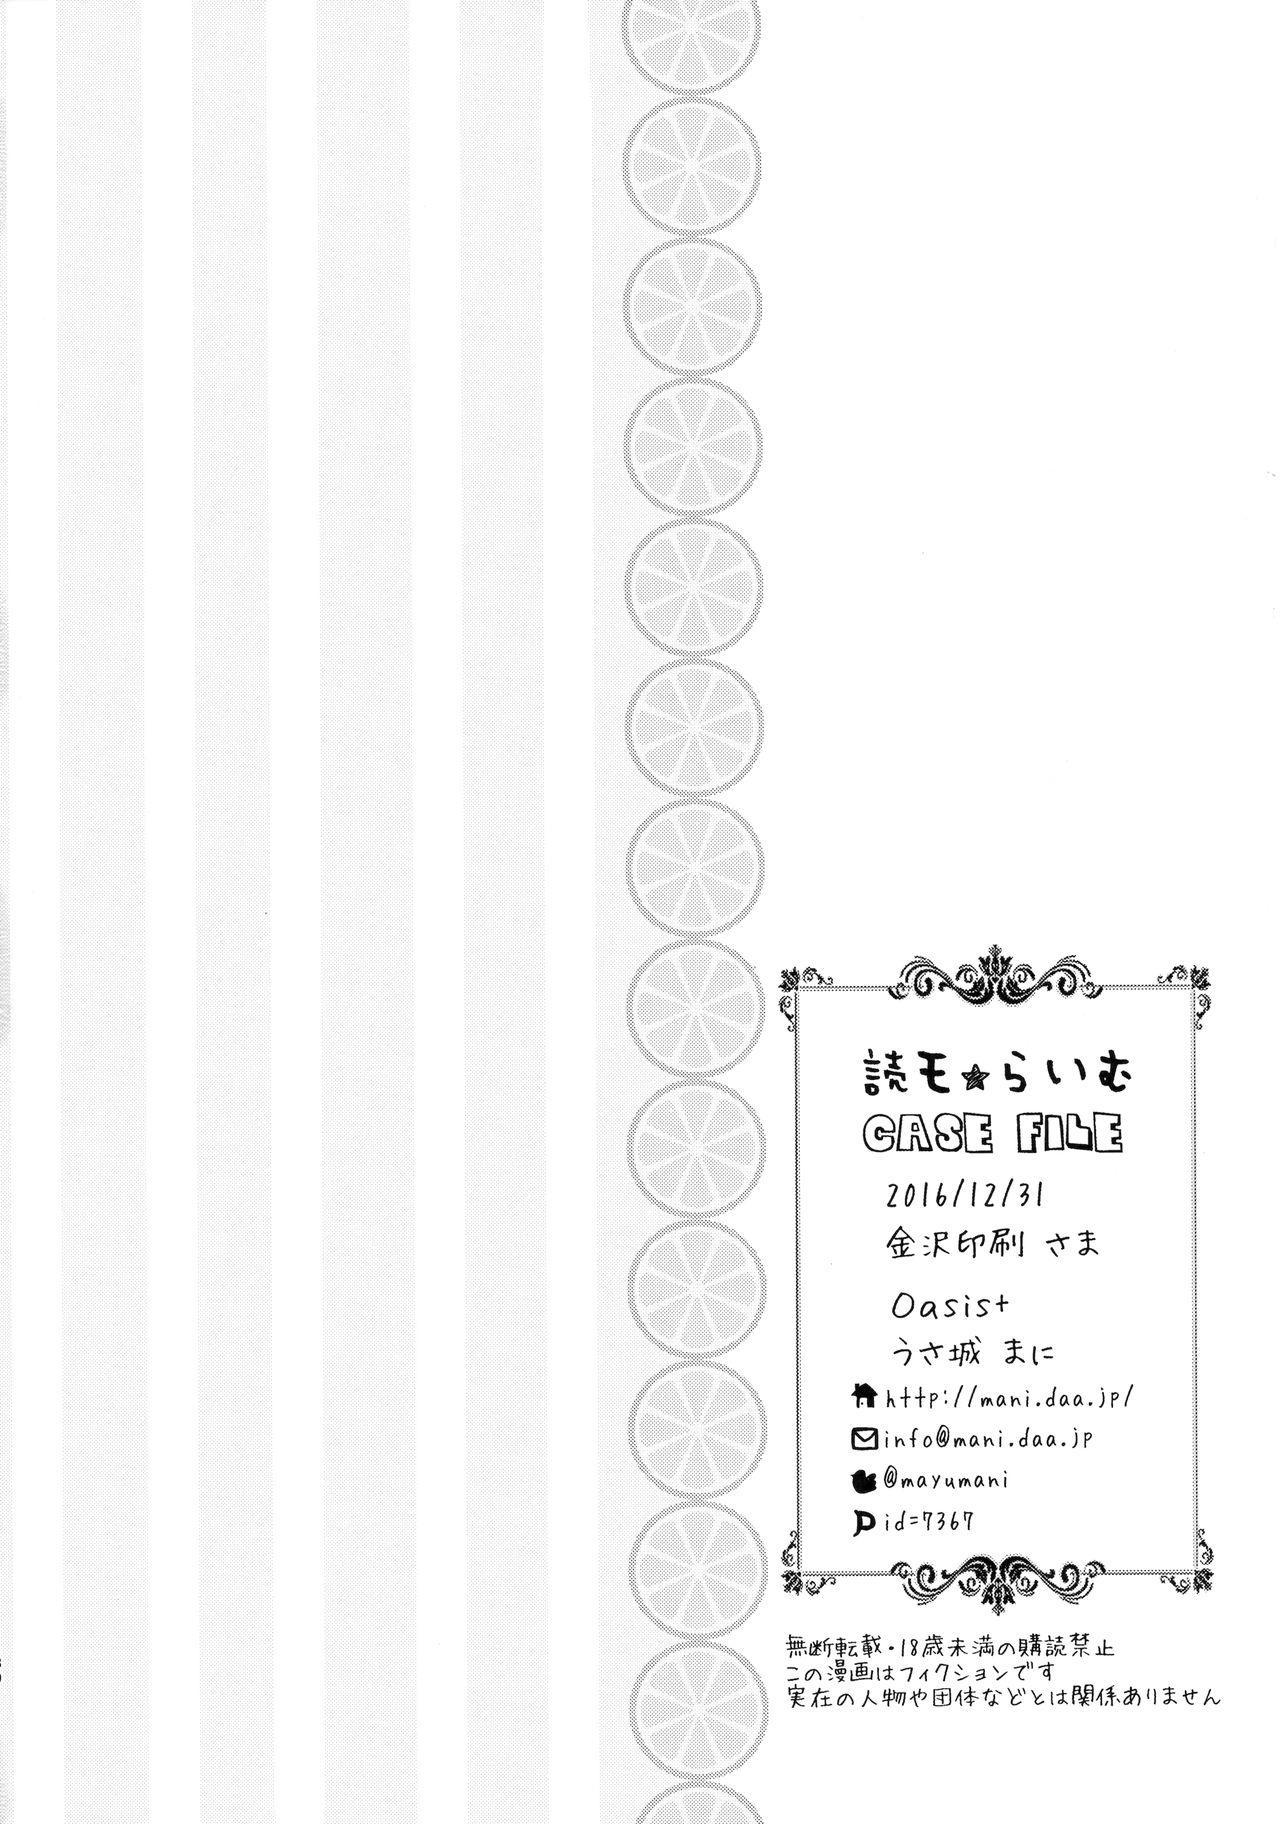 Dokumo Lime CASE FILE 28